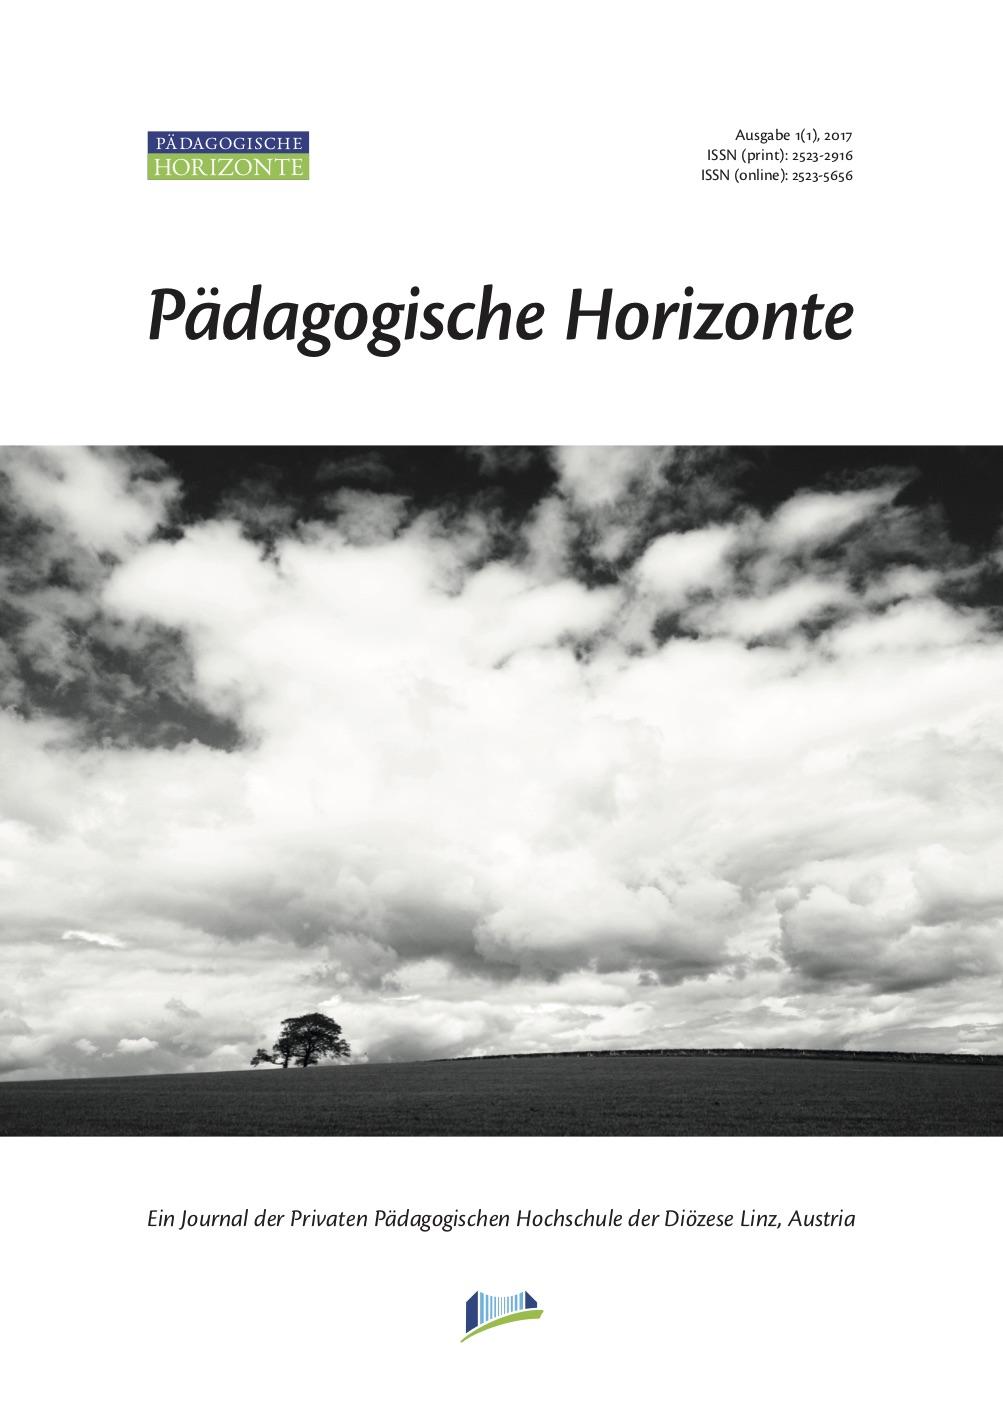 Pädagogische Horizonte 1(1), 2017